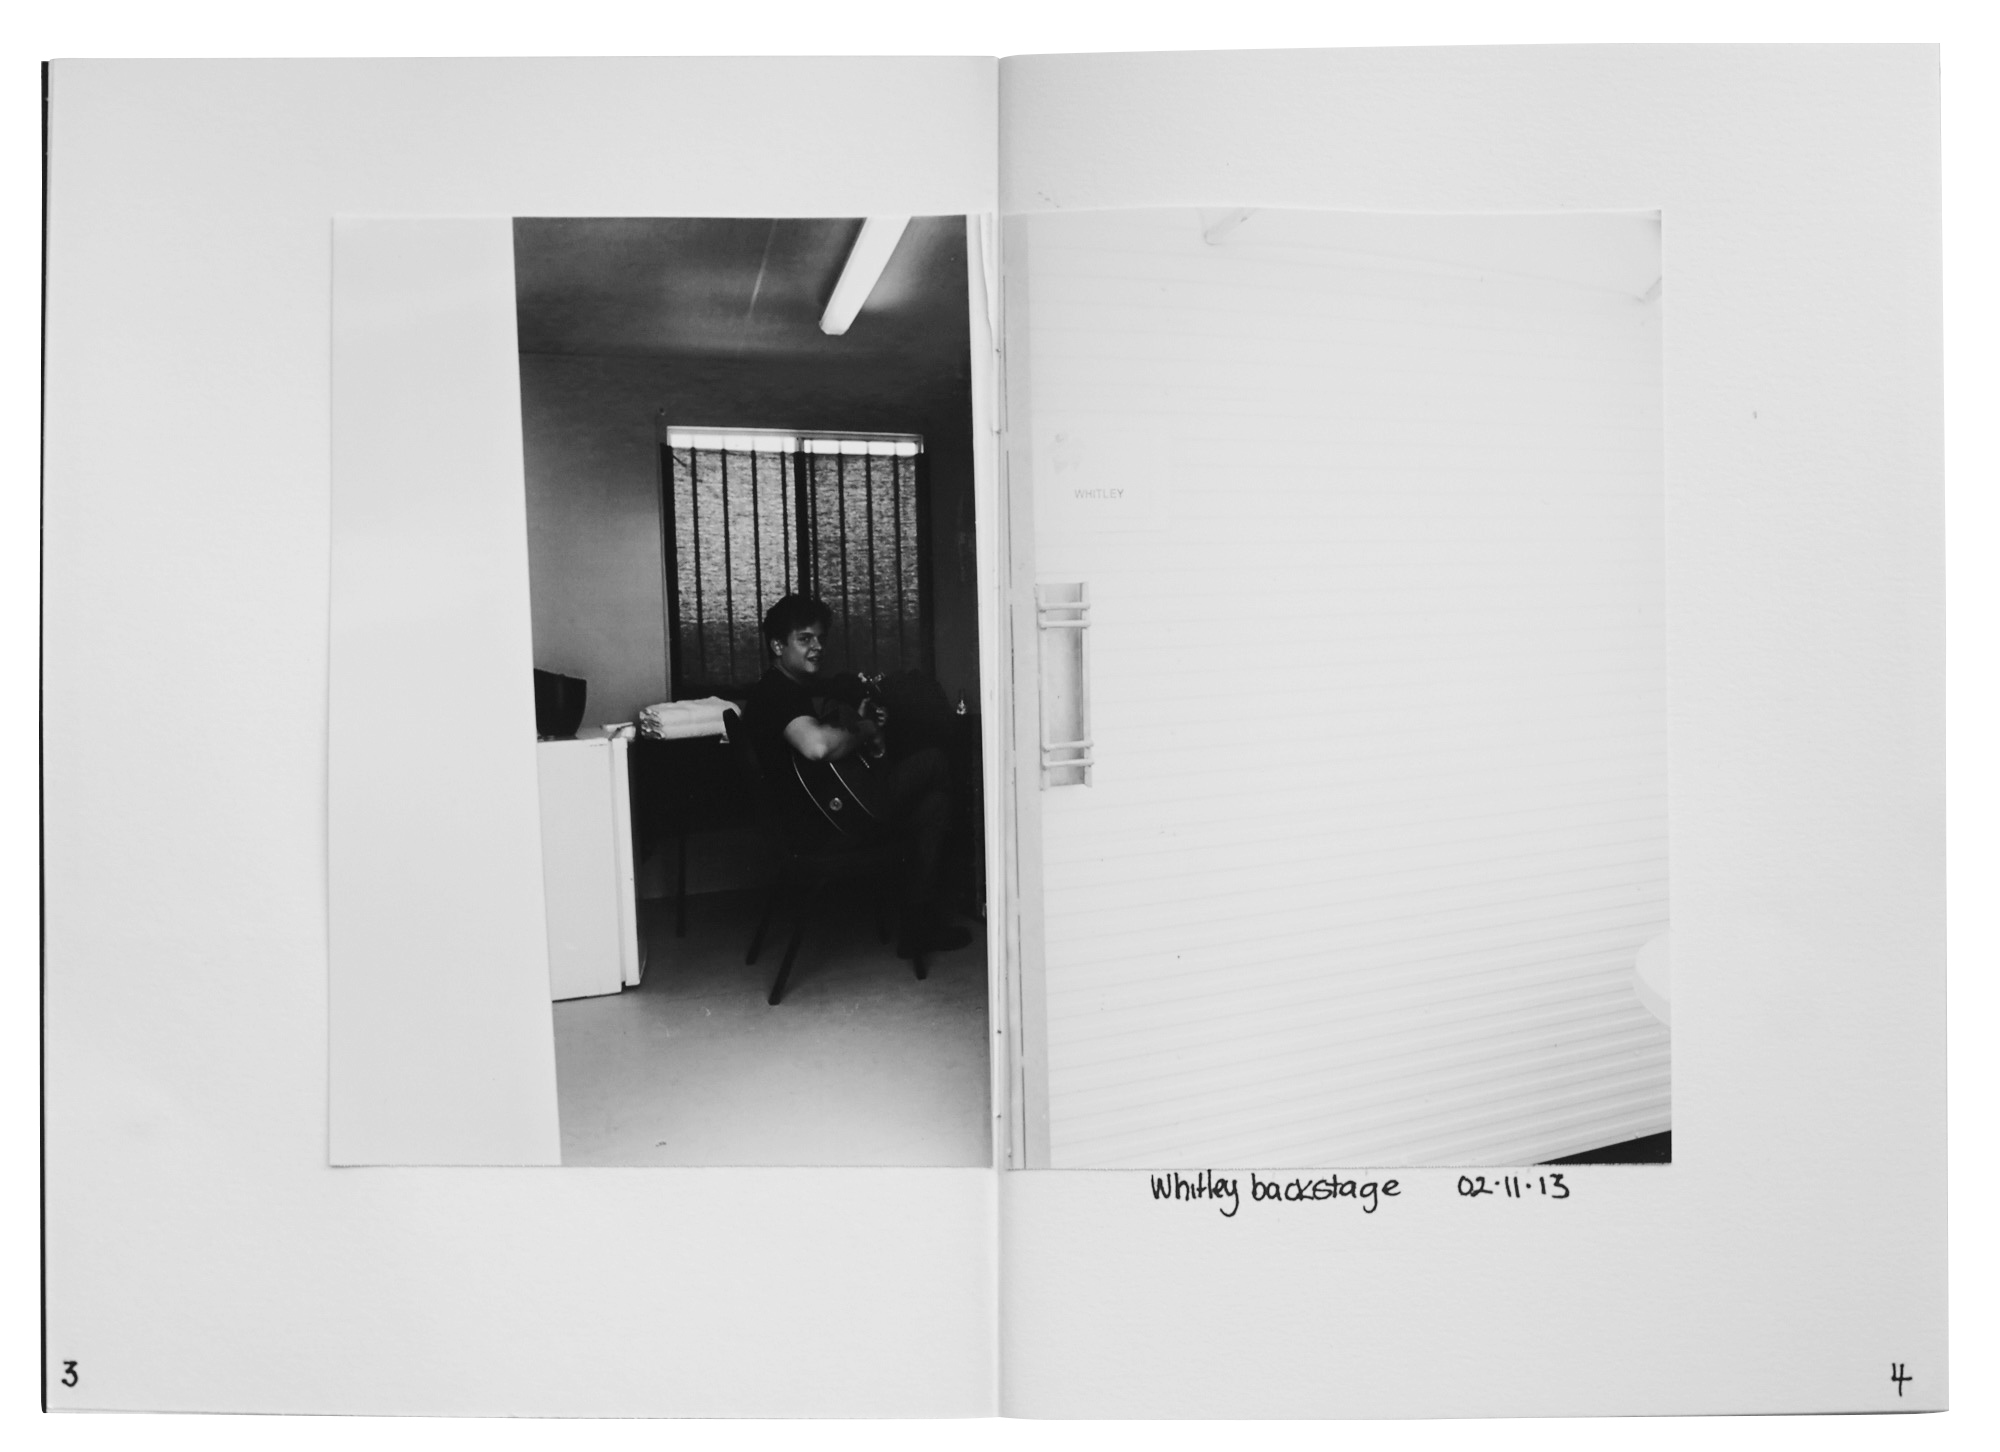 scrapbook-pg-02 copy.jpg